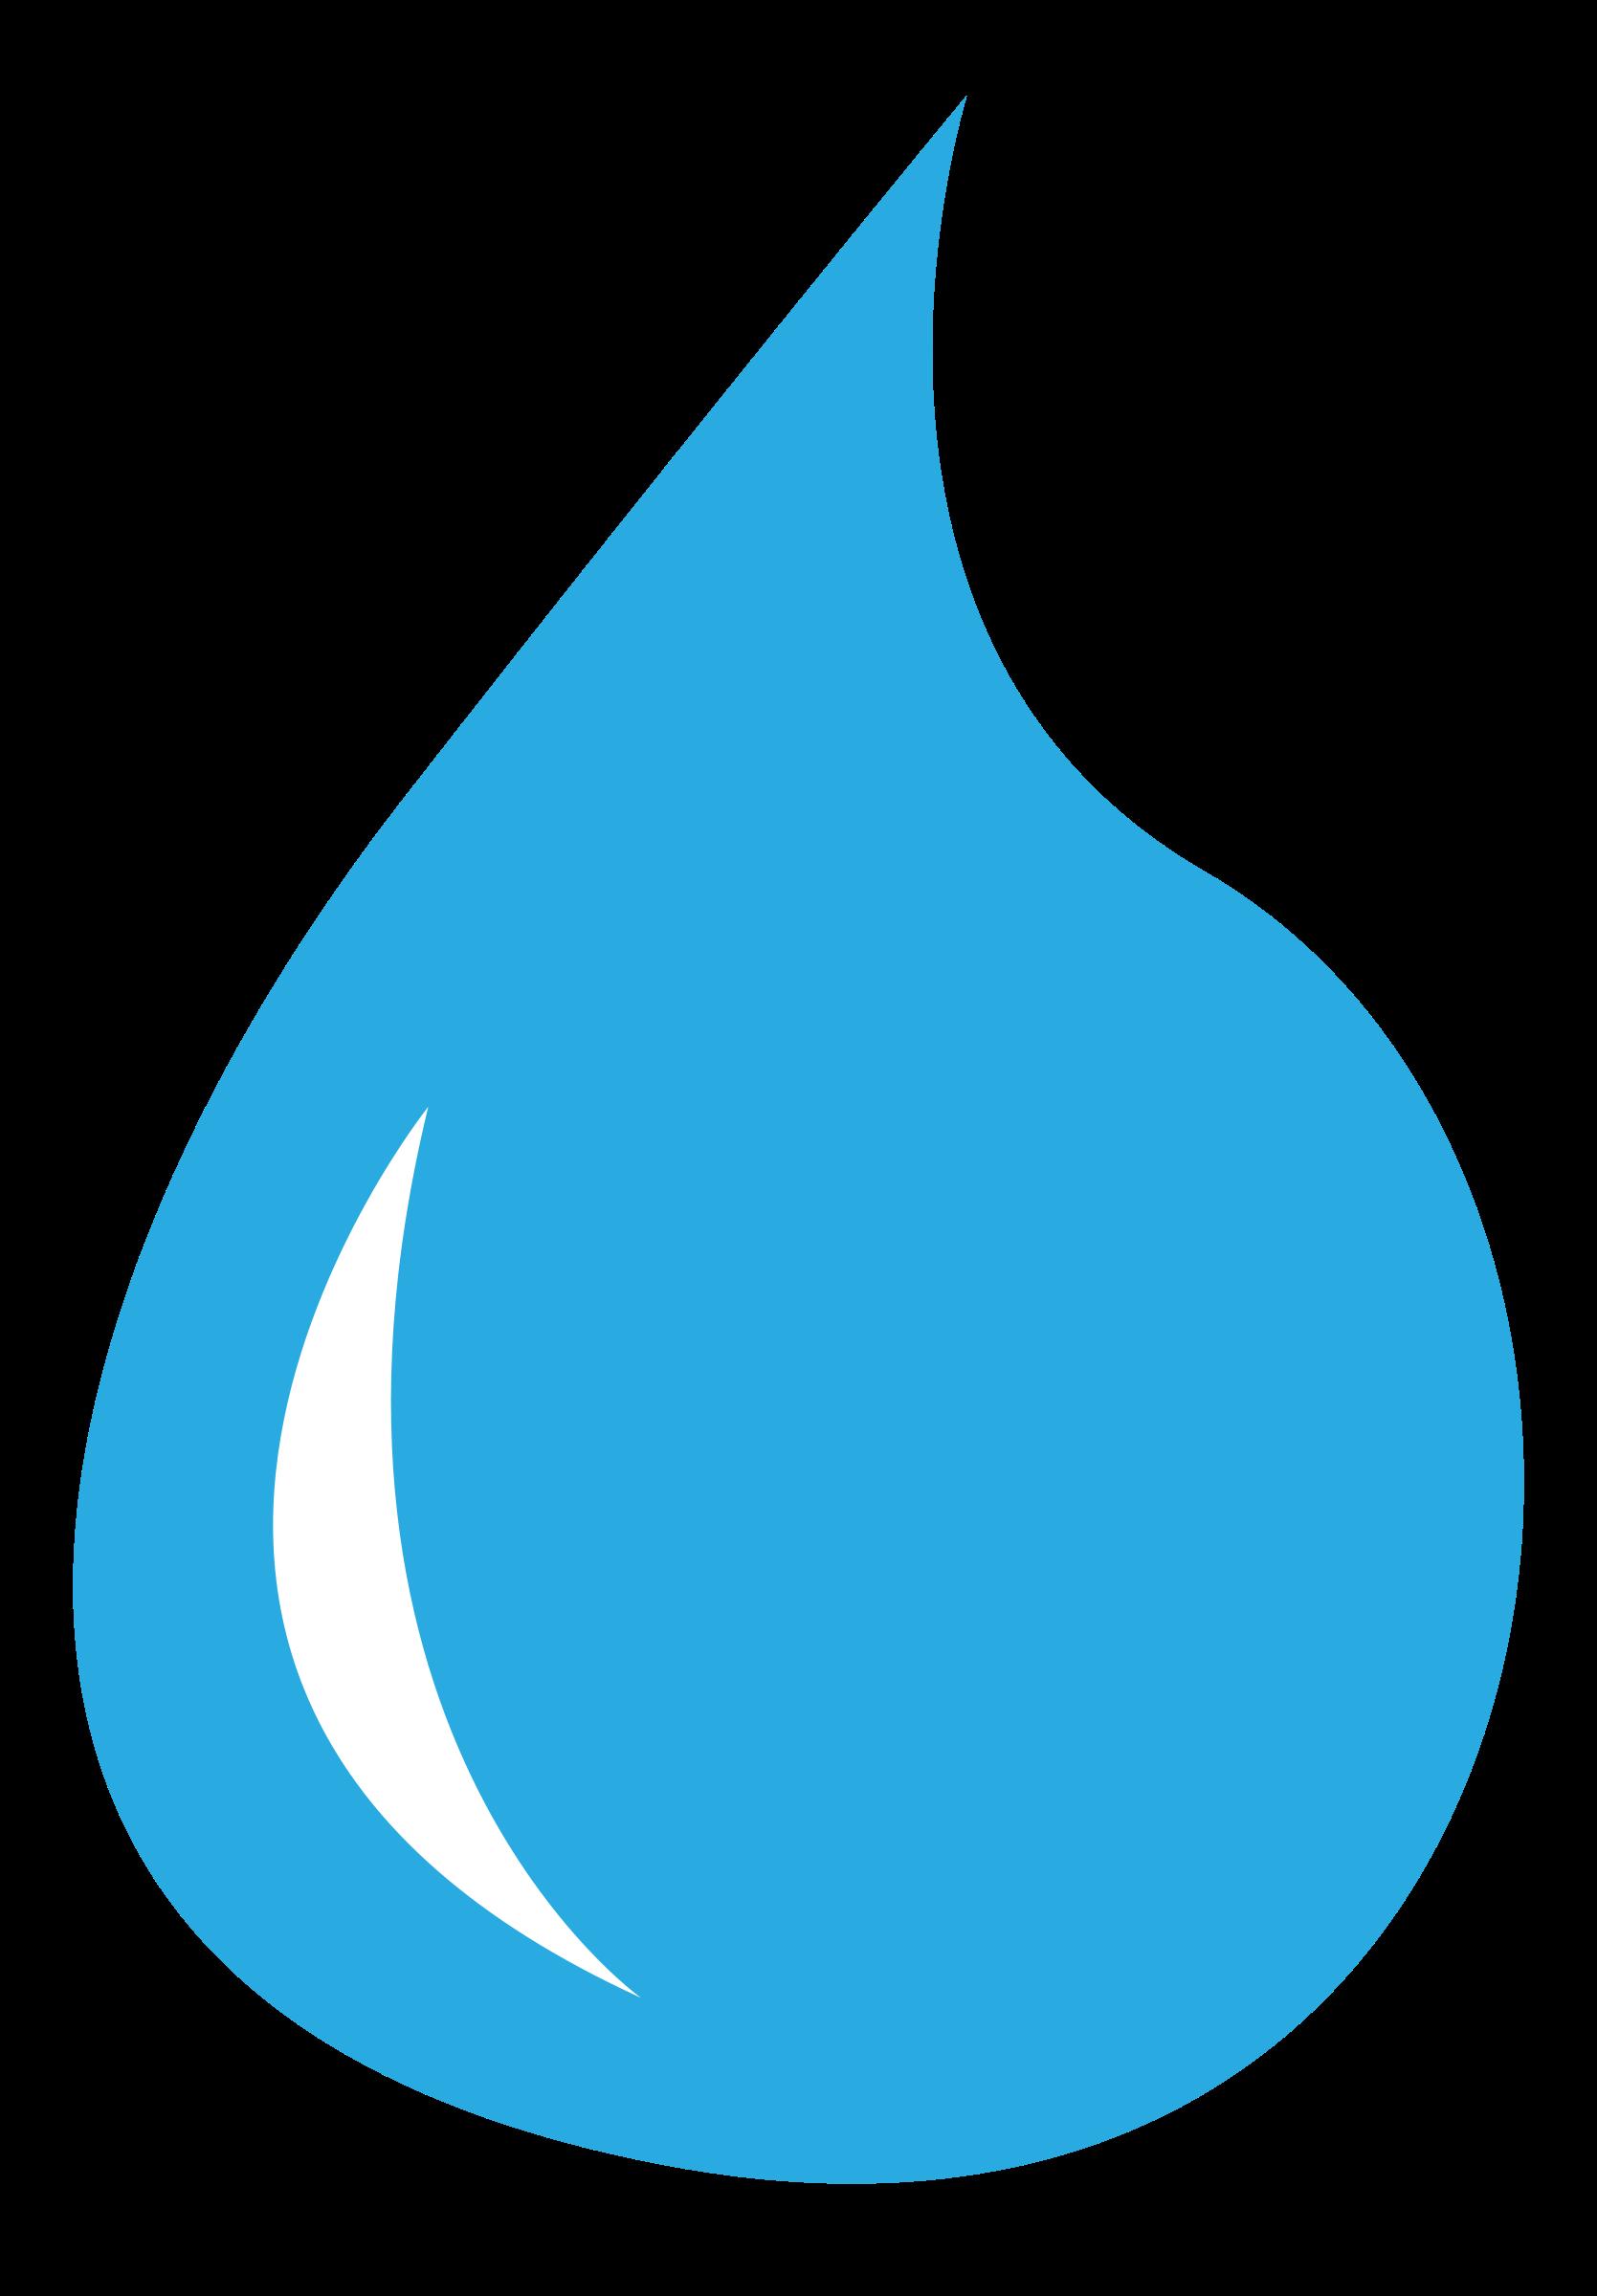 Transparent Water Drop Clipart - Clipart Kid